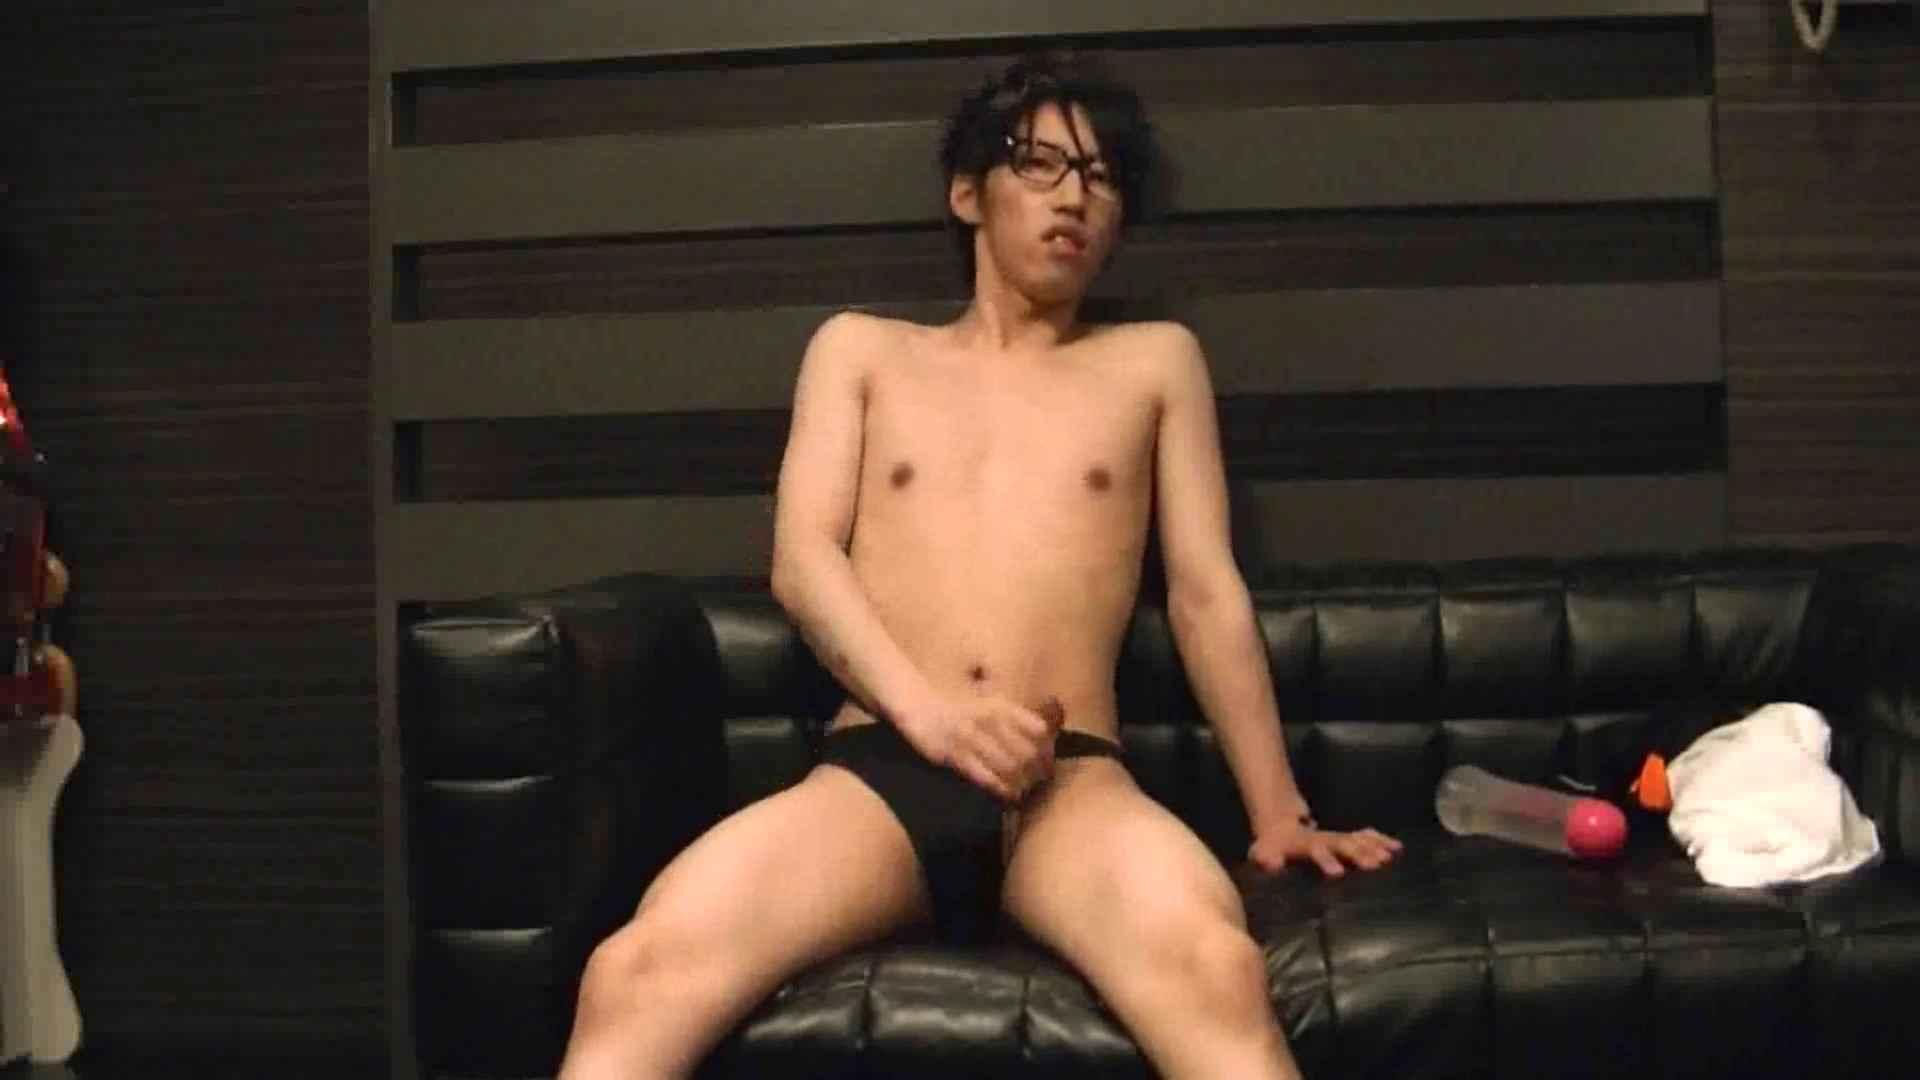 ONA見せカーニバル!! Vol3 男 ゲイ無料無修正画像 89枚 55